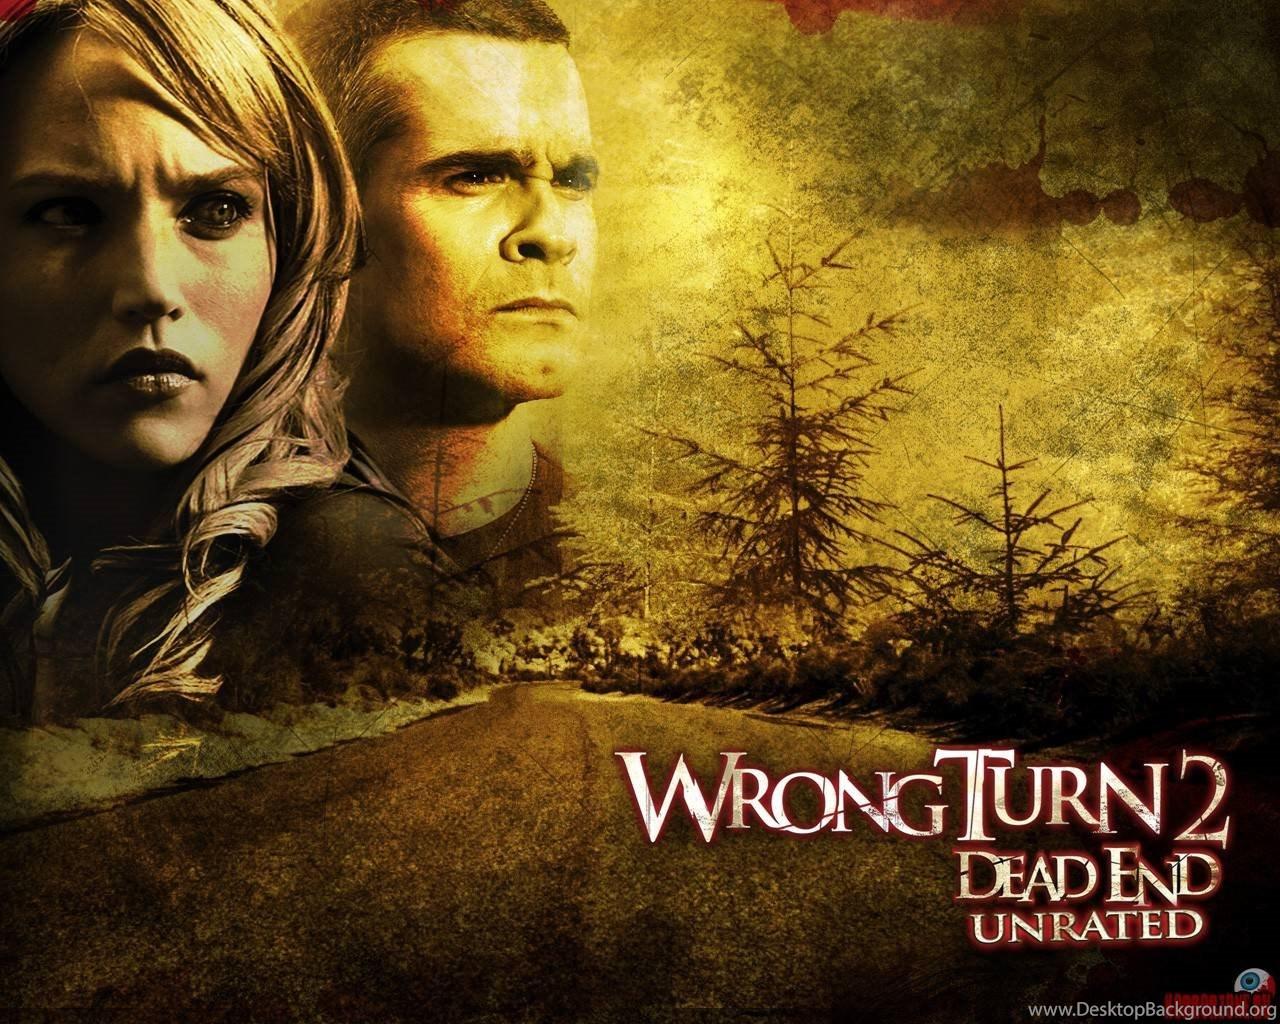 Wrong Turn 2 Dead End Wallpaper Slasher Films Wallpapers Desktop Background